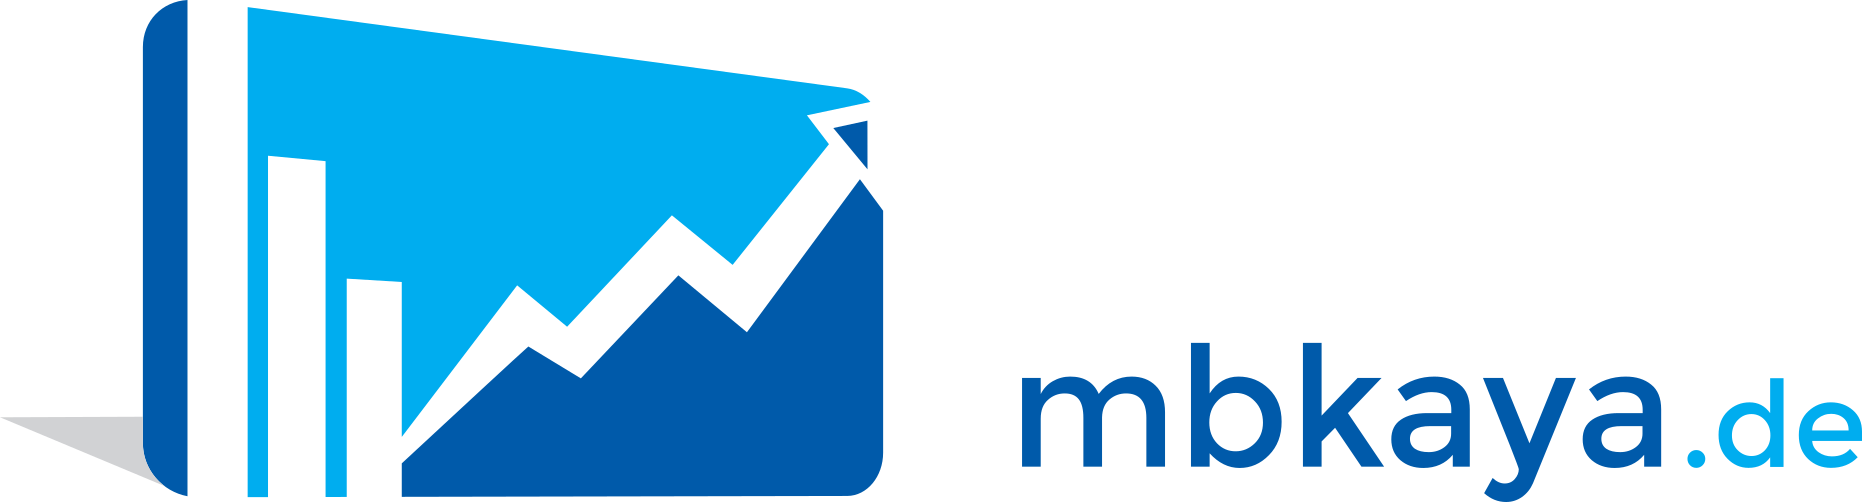 mbkaya.de